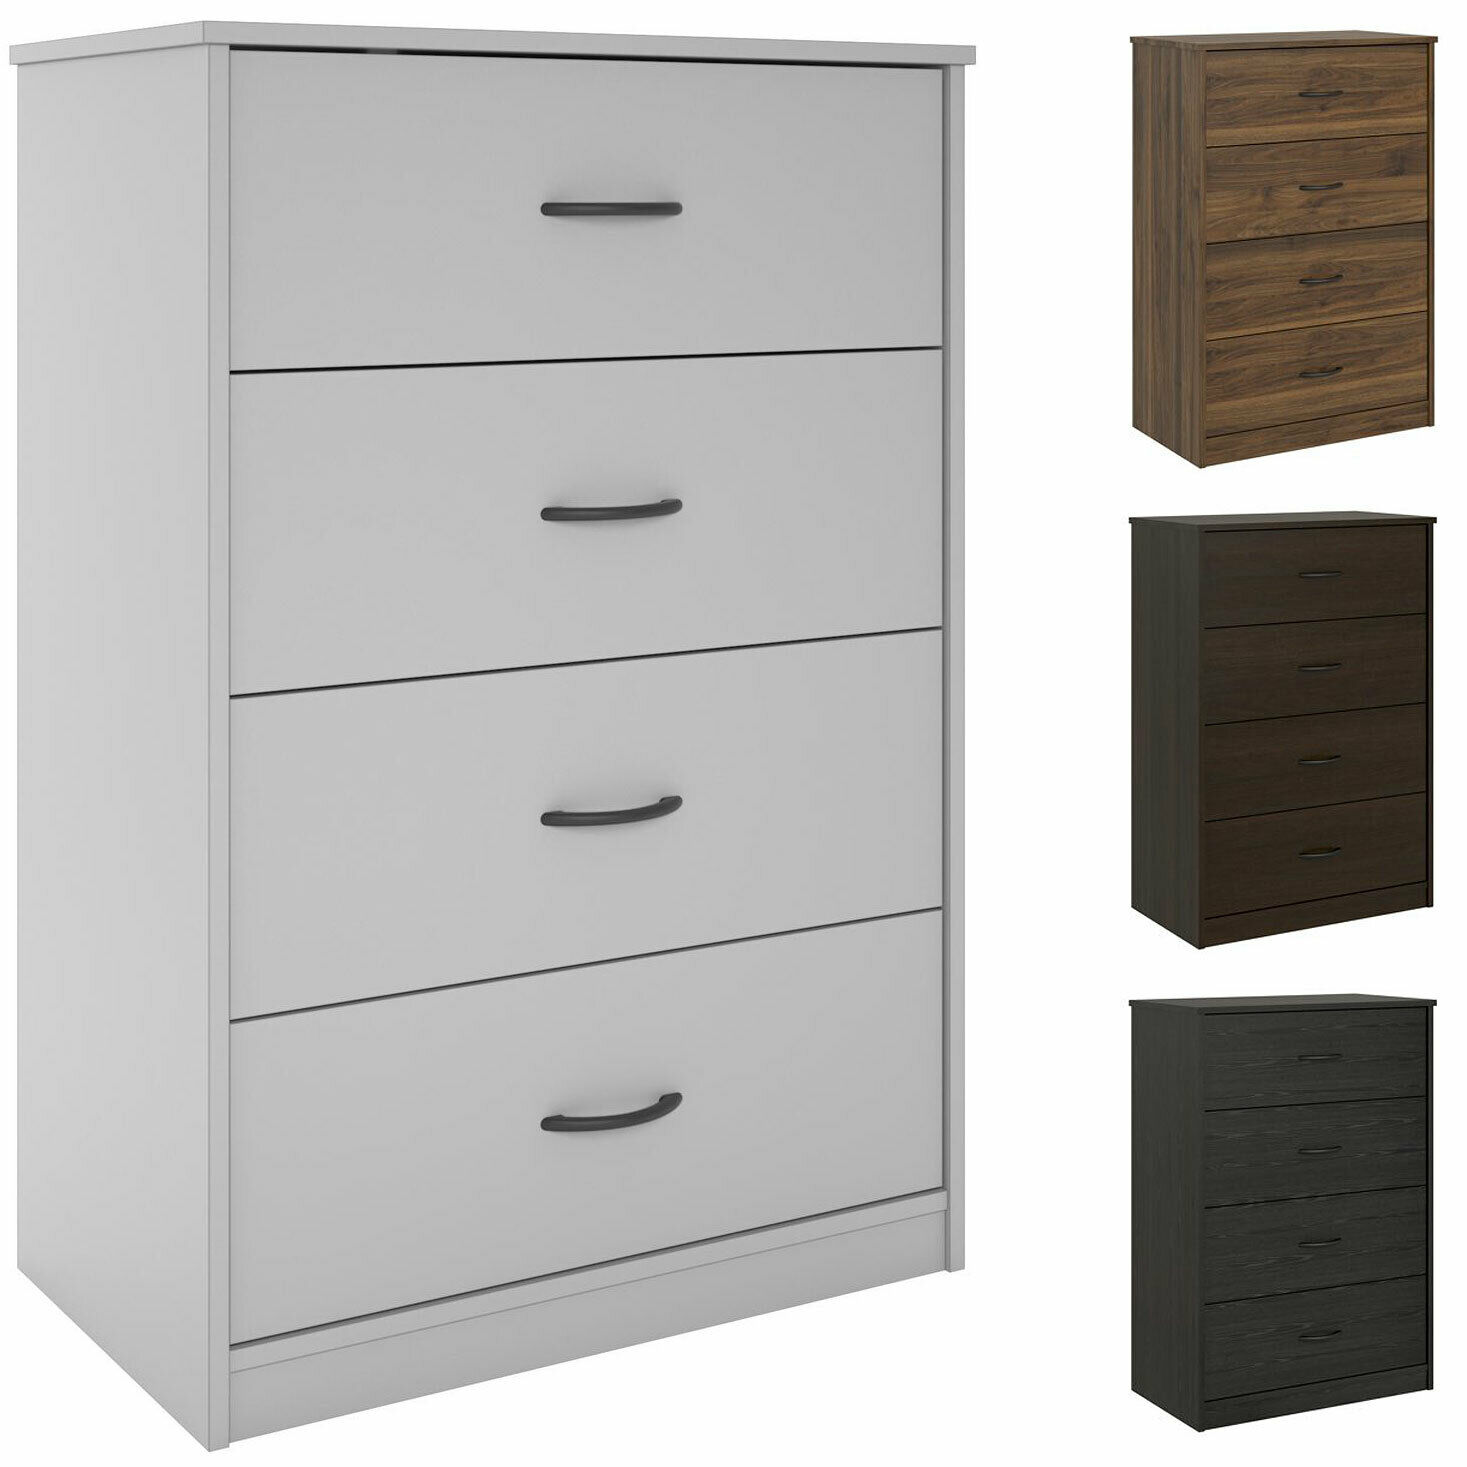 40 Tall 4 Drawer Modern Dresser Chest Bedroom Storage Wood Furniture 6 Finishes